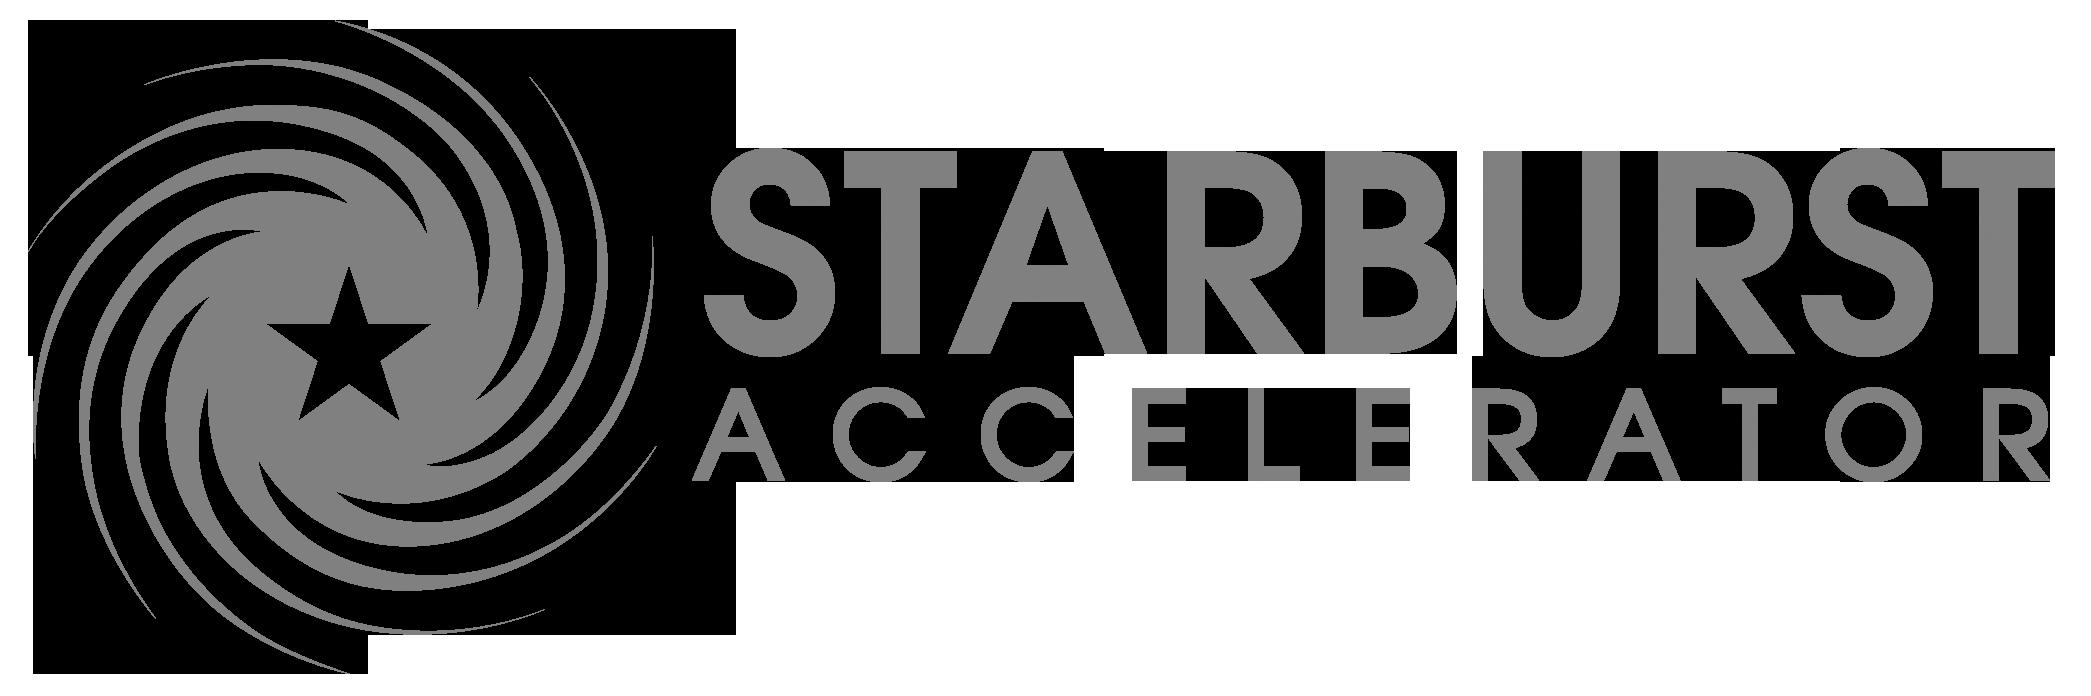 Starburst Accelerator_logo black and white